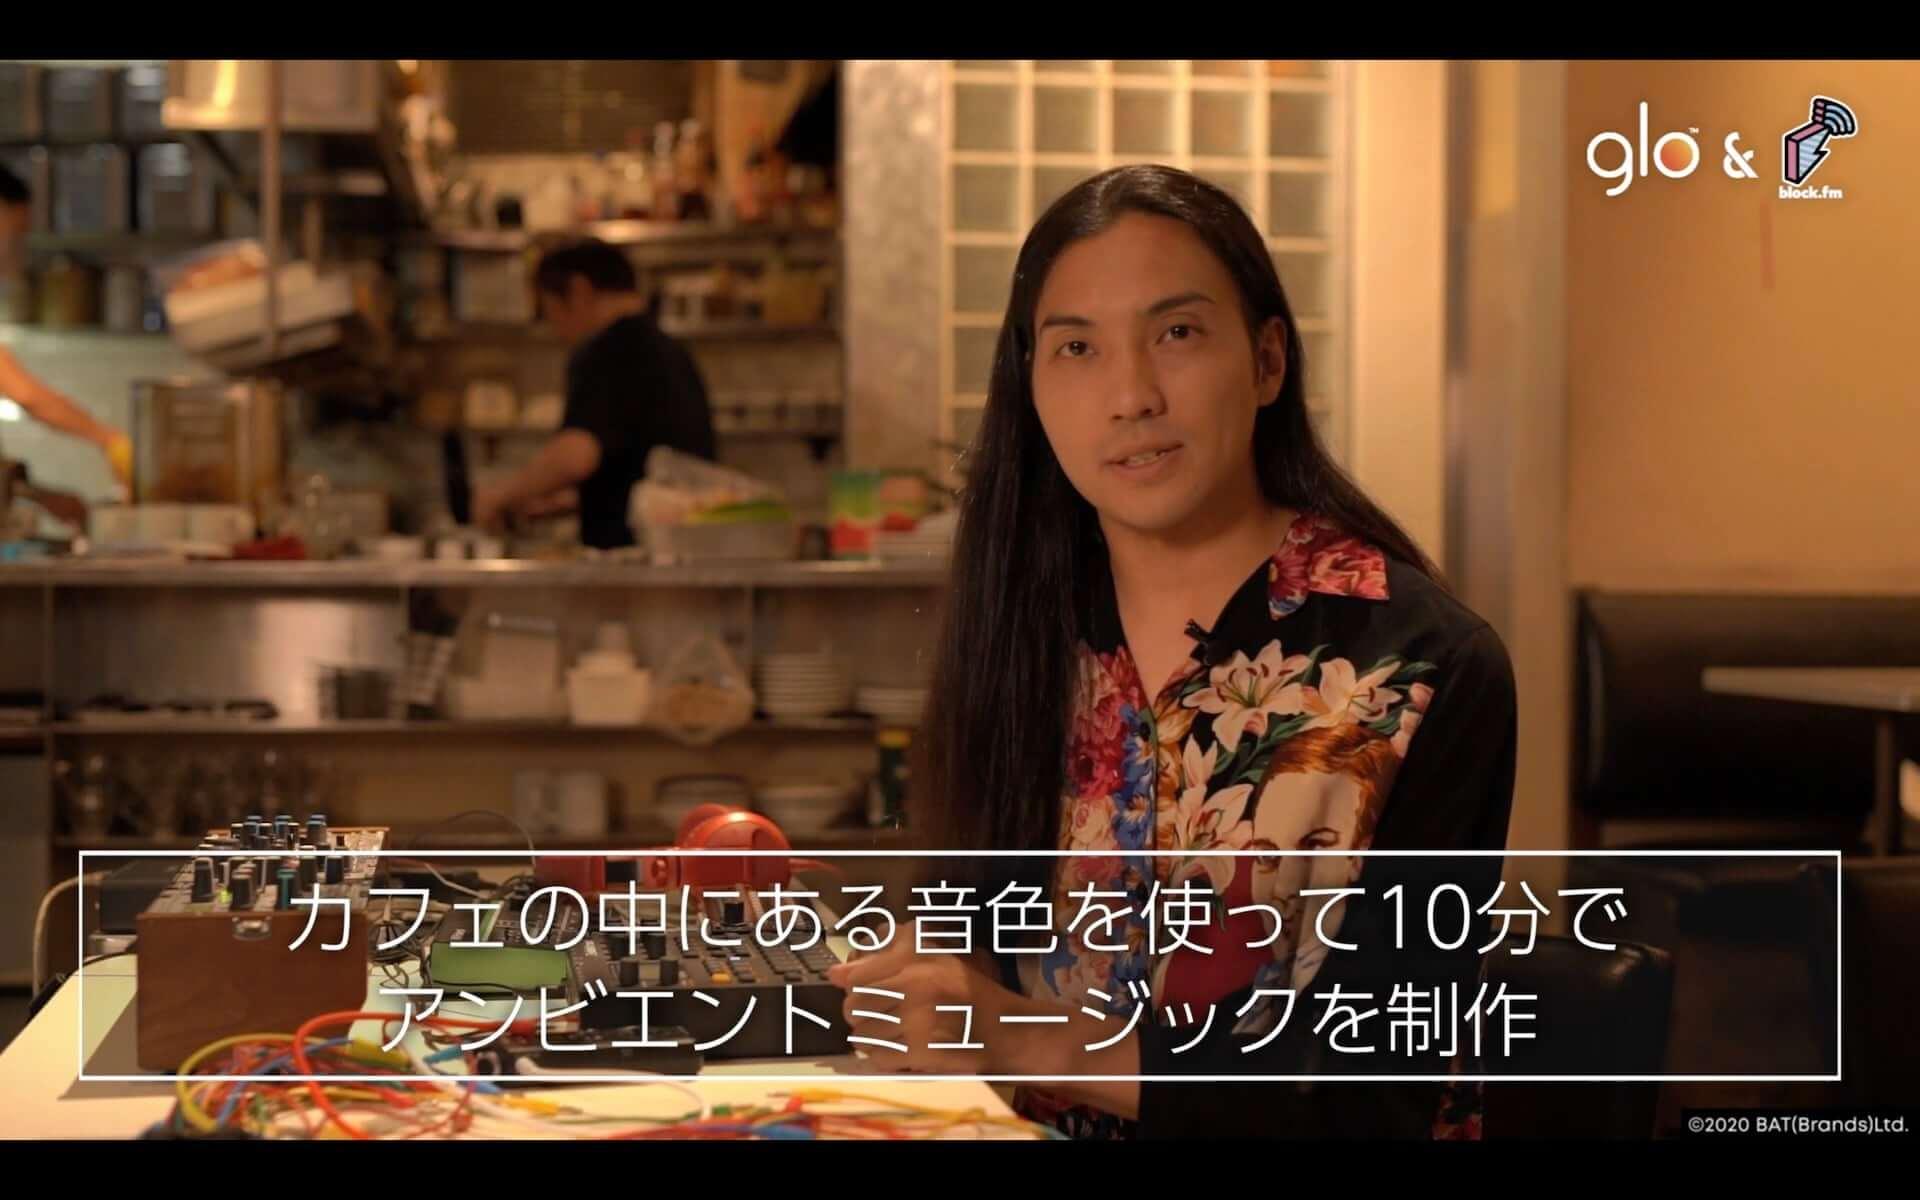 Seiho、tofubeats、Yamato、☆Taku Takahashiが様々なお題に挑戦!glo™とblock.fmが贈る動画シリーズが公開 music200916_glo-blockfm_10-1920x1200